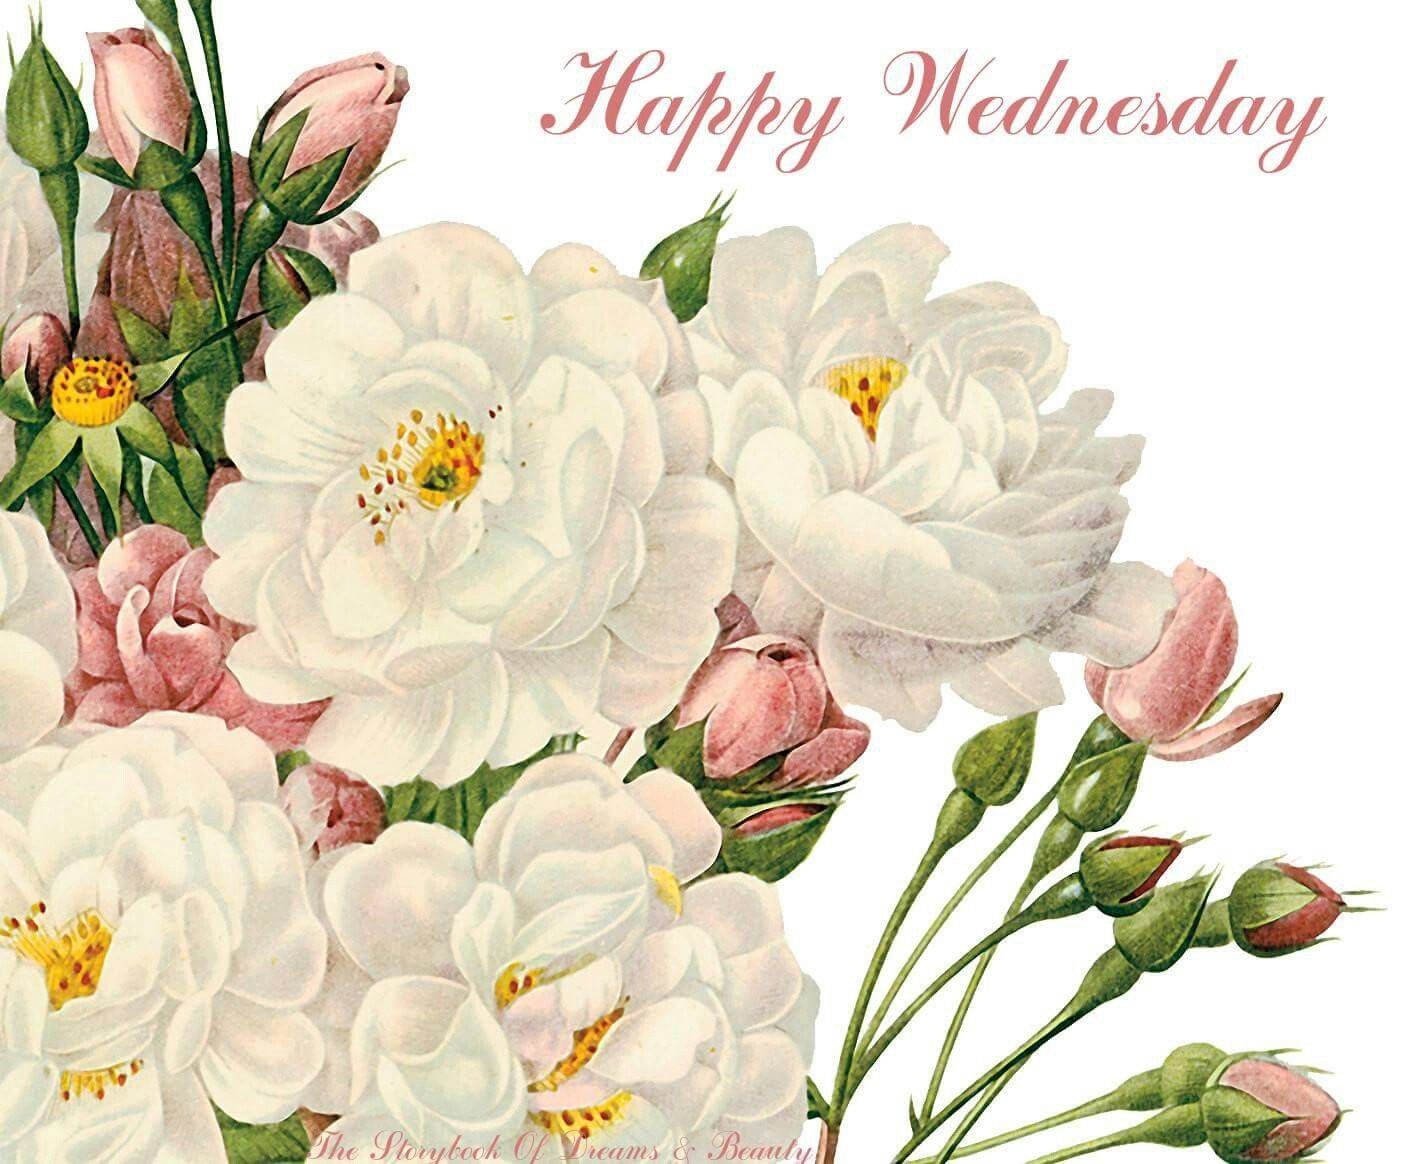 Happy Wednesday wednesday wednesday quotes happy wednesday ... |Wednesday Flowers